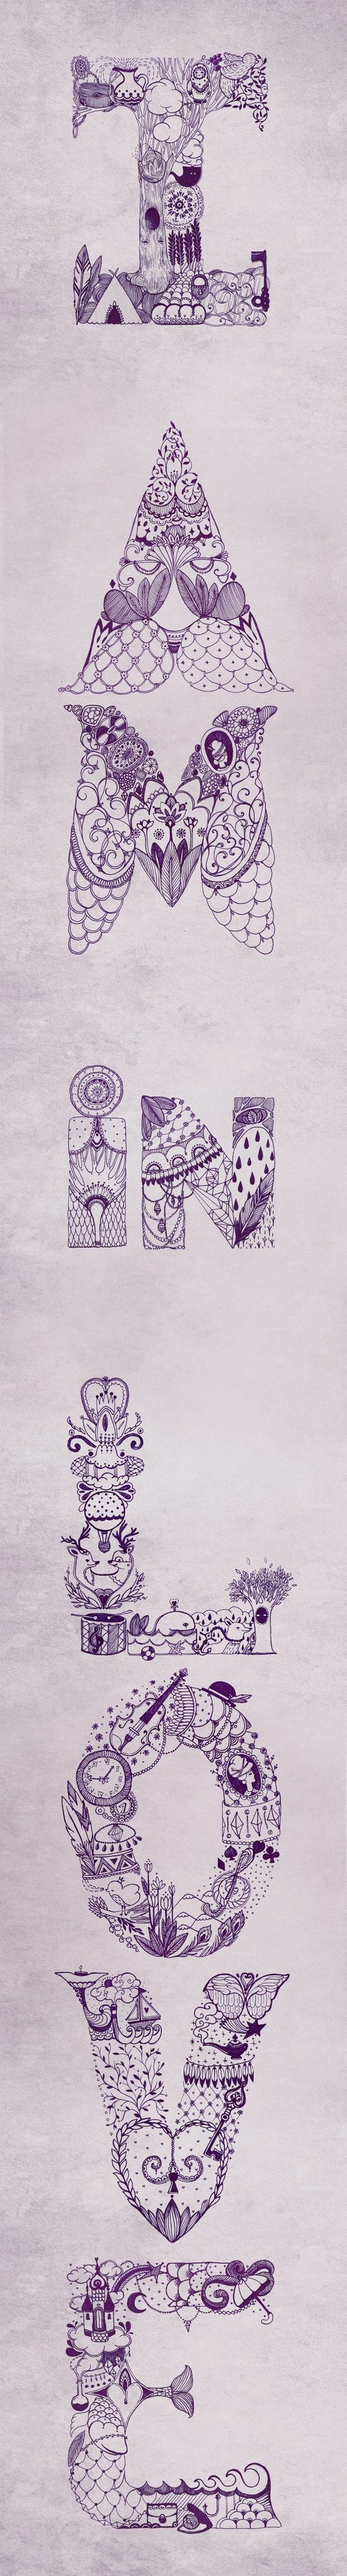 typo-drawing by Ei Ka